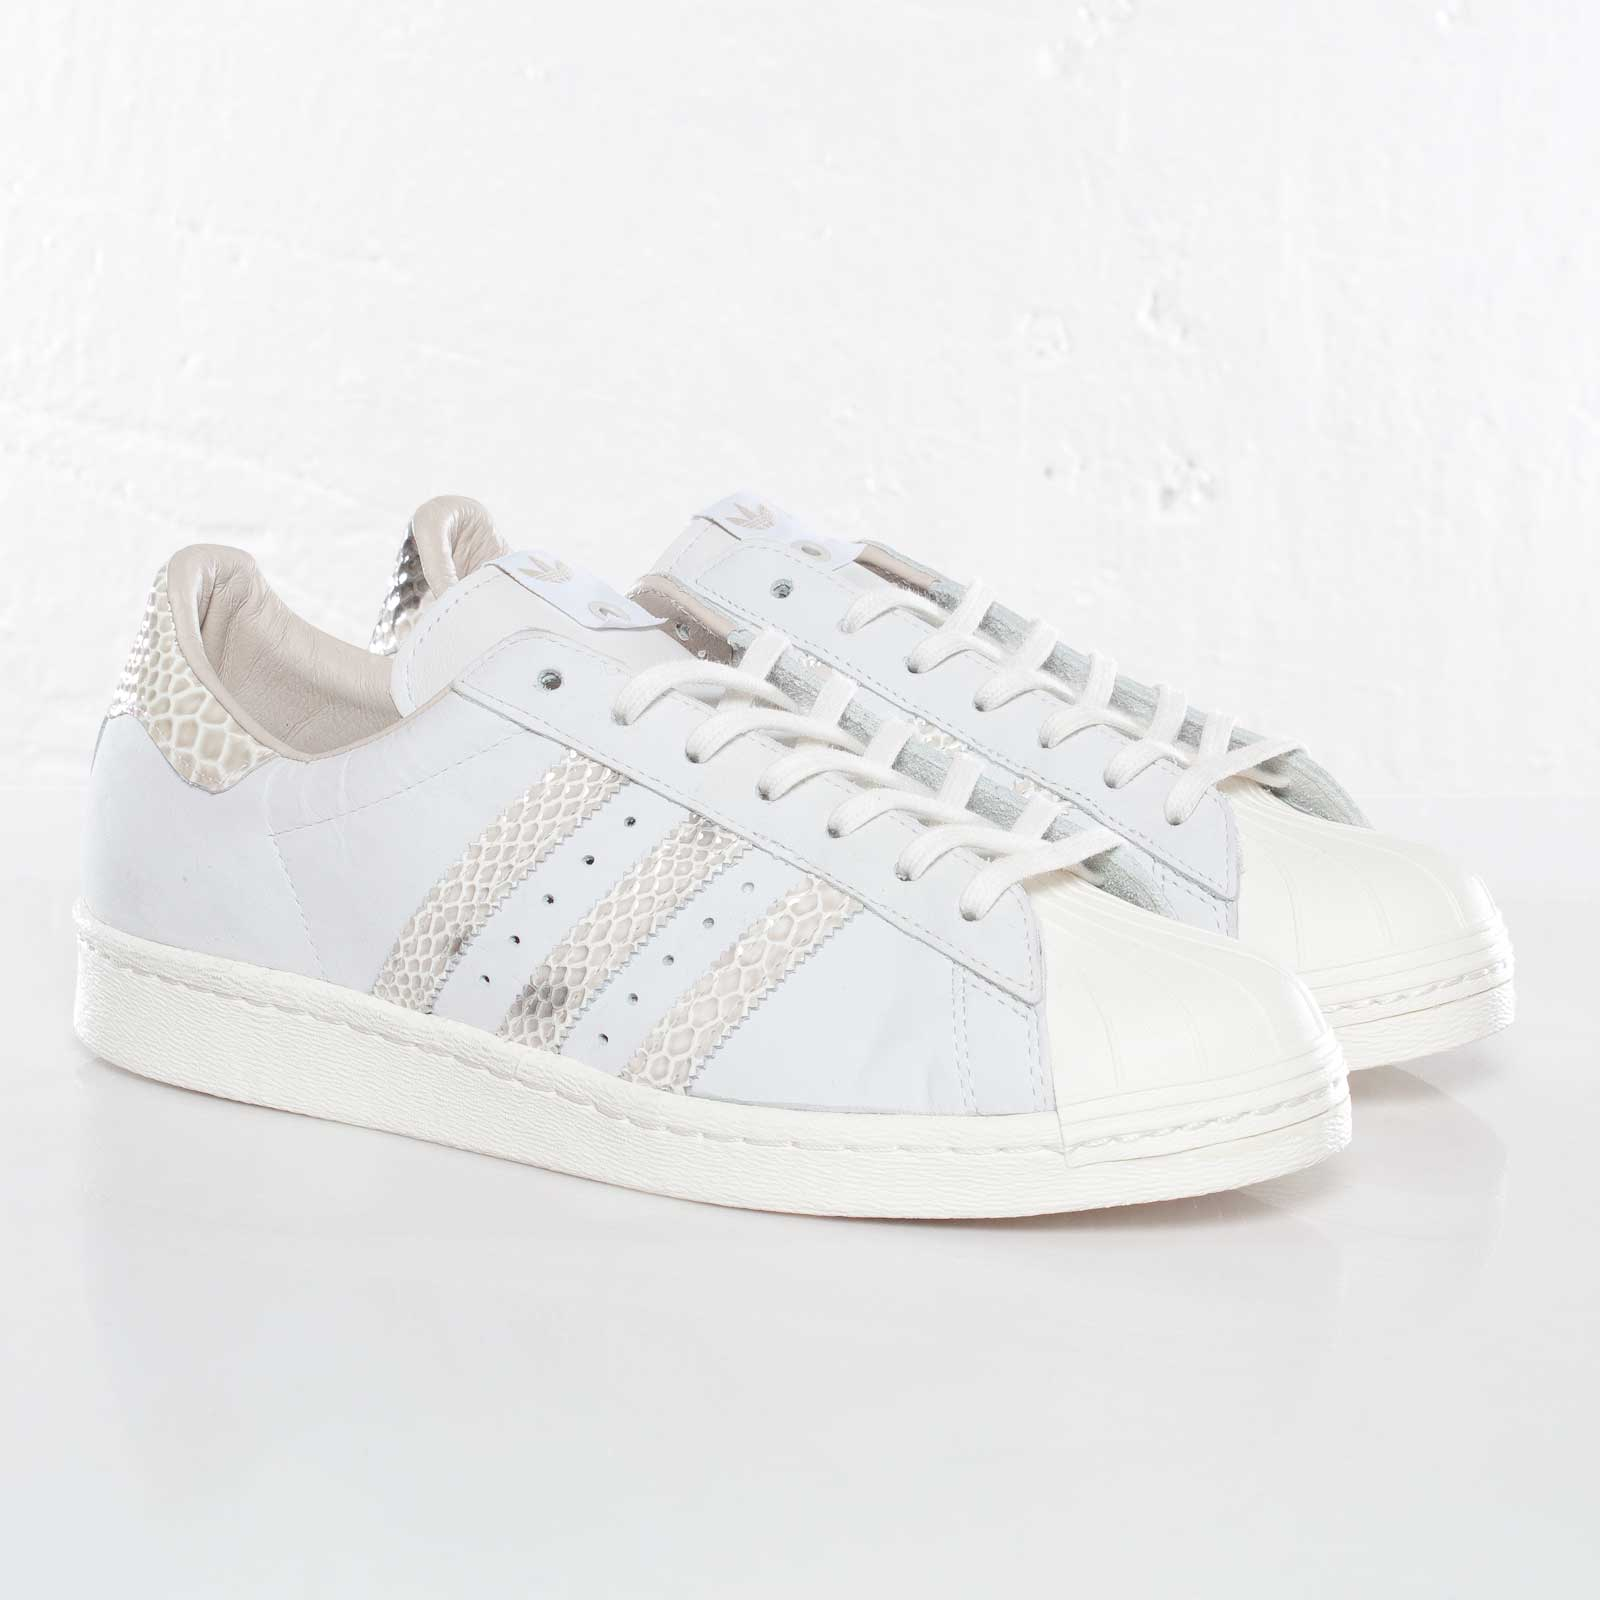 Adidas Superstar Degli Anni '80 Q21803 Scarpe da Ginnasticanstuff Scarpe